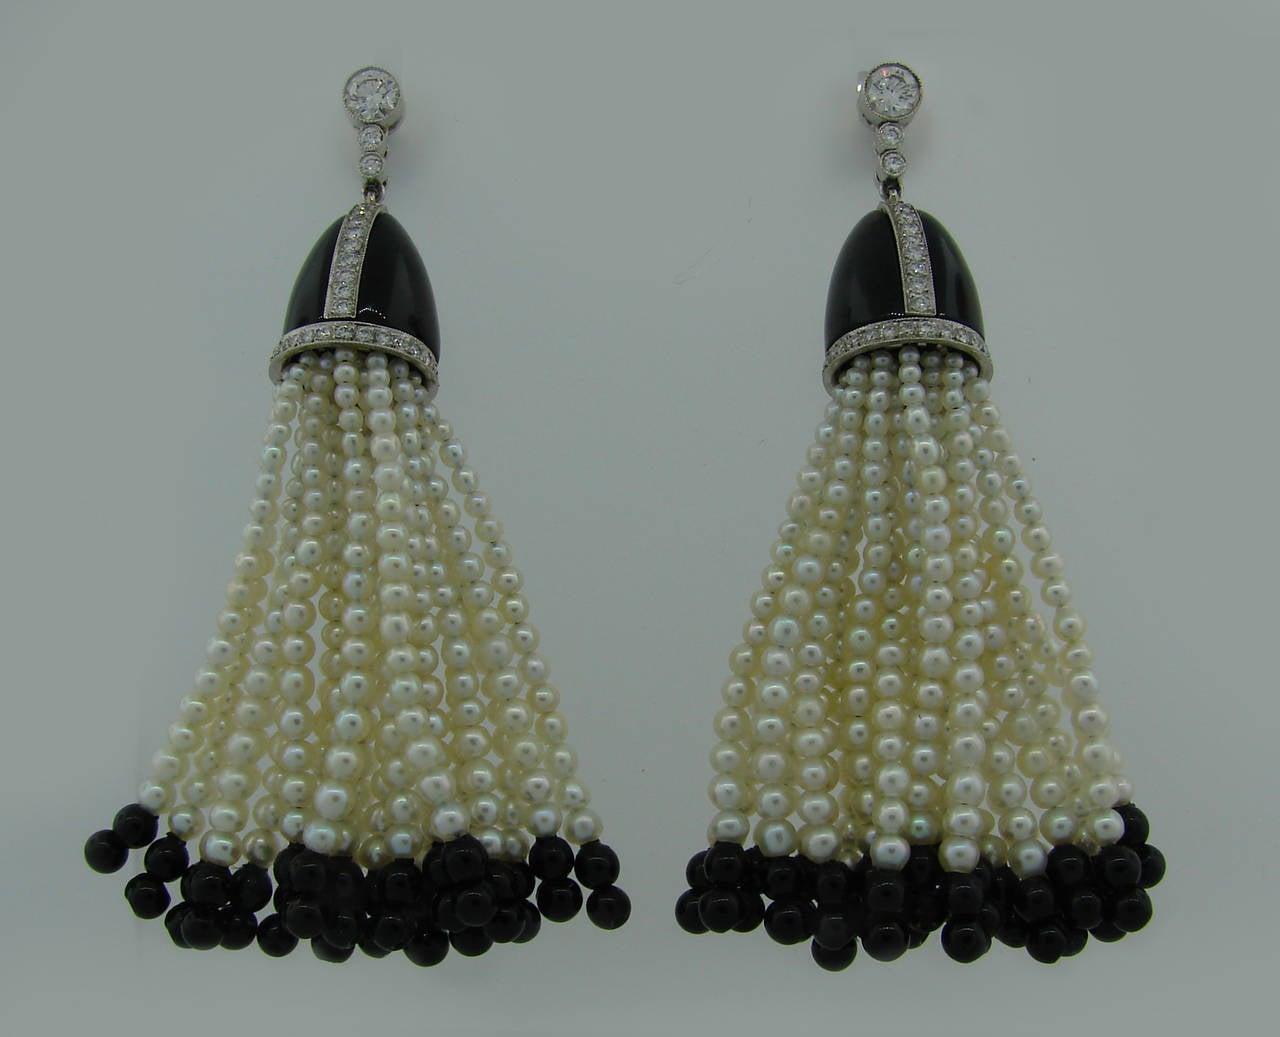 48df808b5 Seed Pearl Black Onyx Diamond Platinum Tassel Earrings For Sale. Chic and  feminine tassel earrings created by Tiffany & Co. in the 1960's.